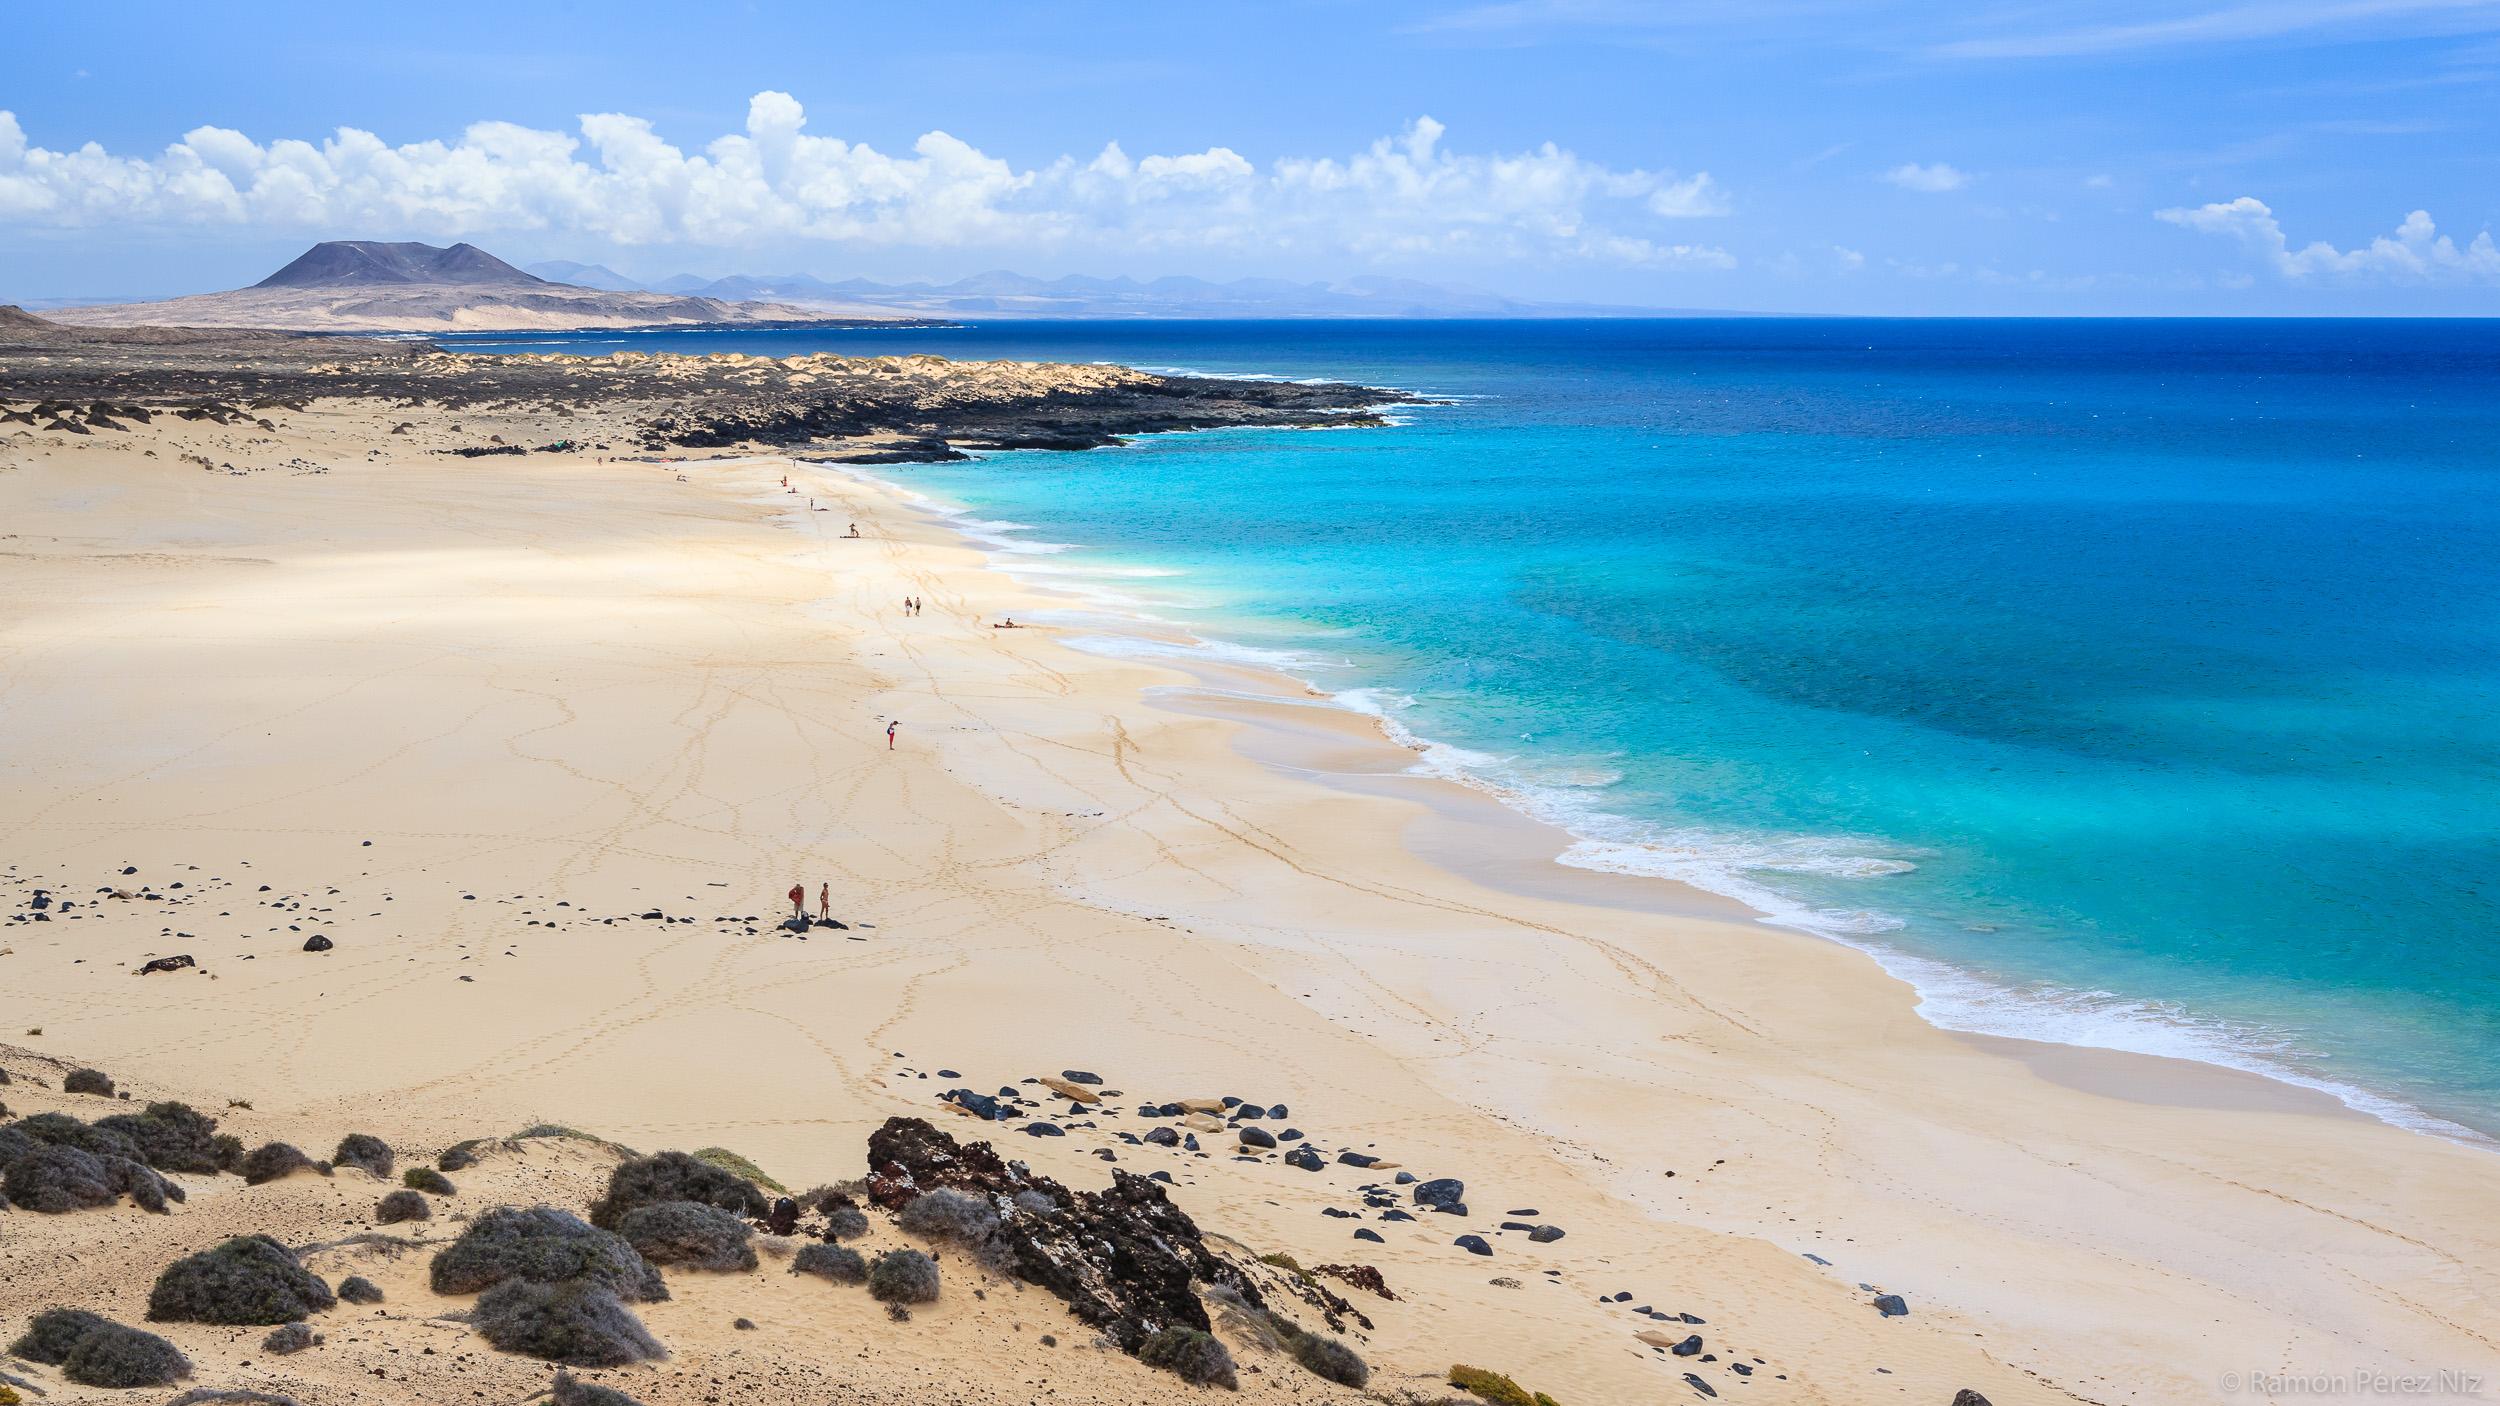 Playa de Las Conchas, foto de Ramón Pérez Niz